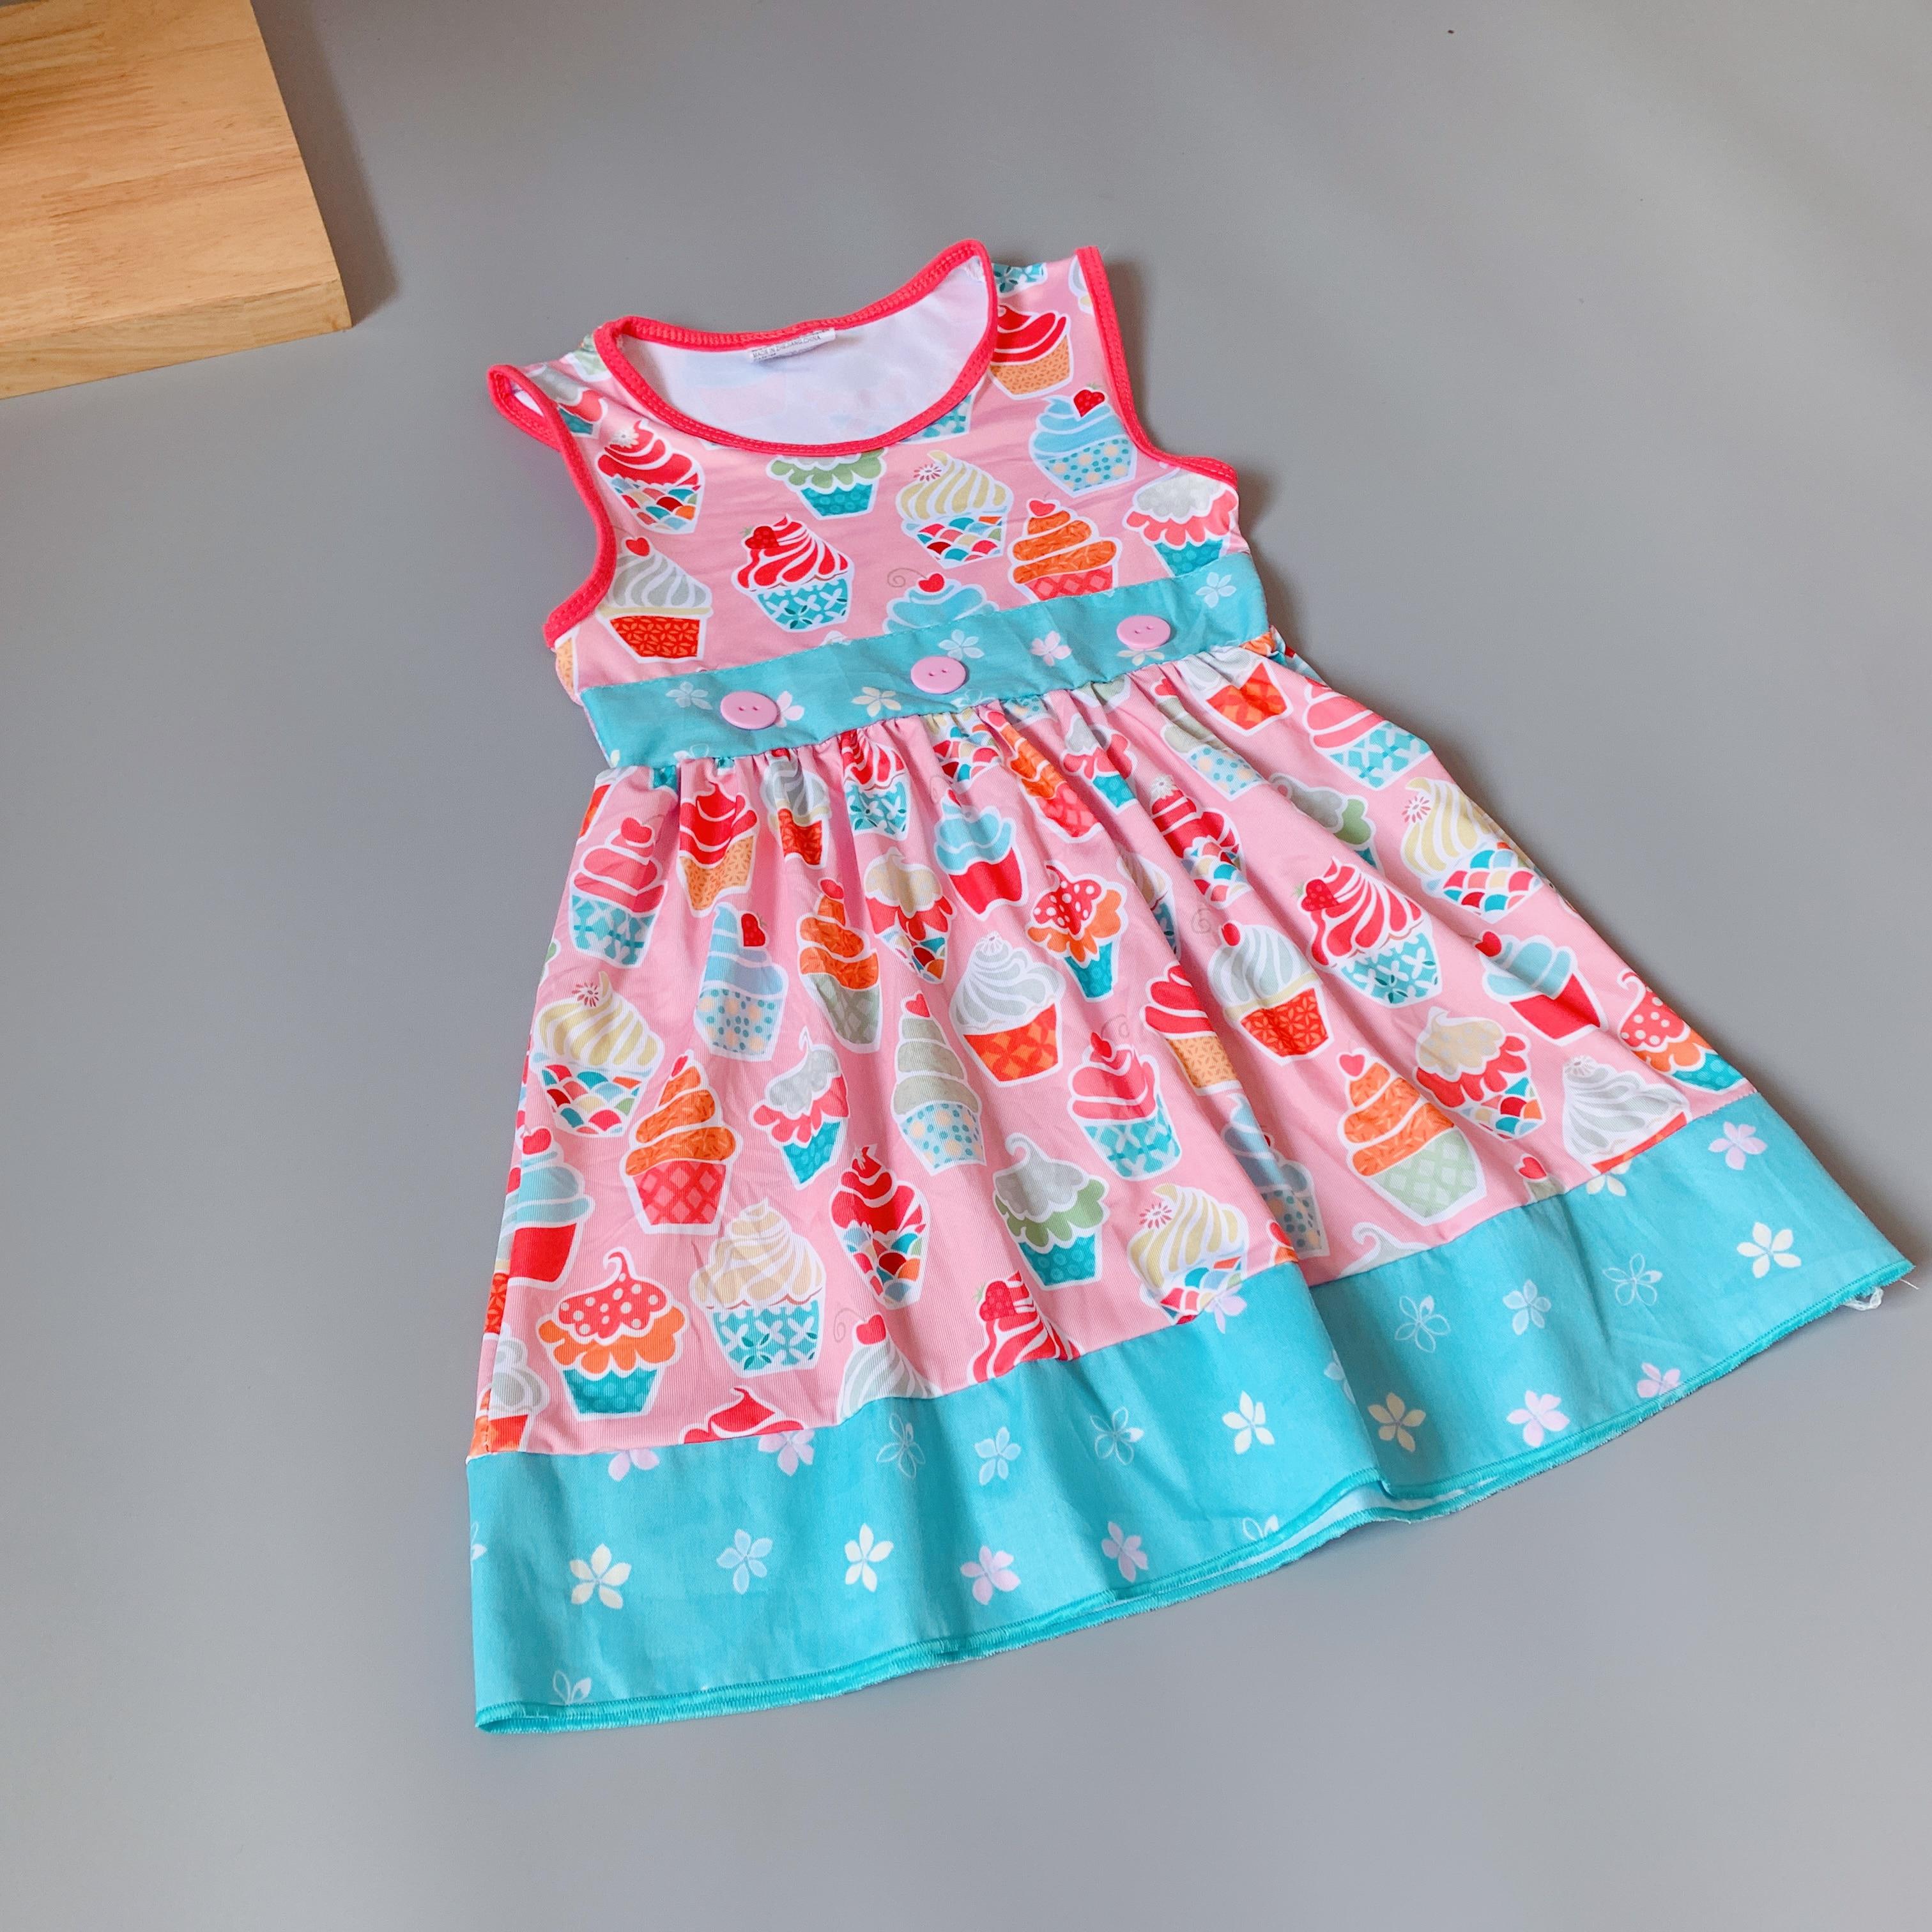 Baby Girls dress floral Flower boutique Infants toddler Kids ruffles big girl princess dresses frocks ice cream dress in Dresses from Mother Kids